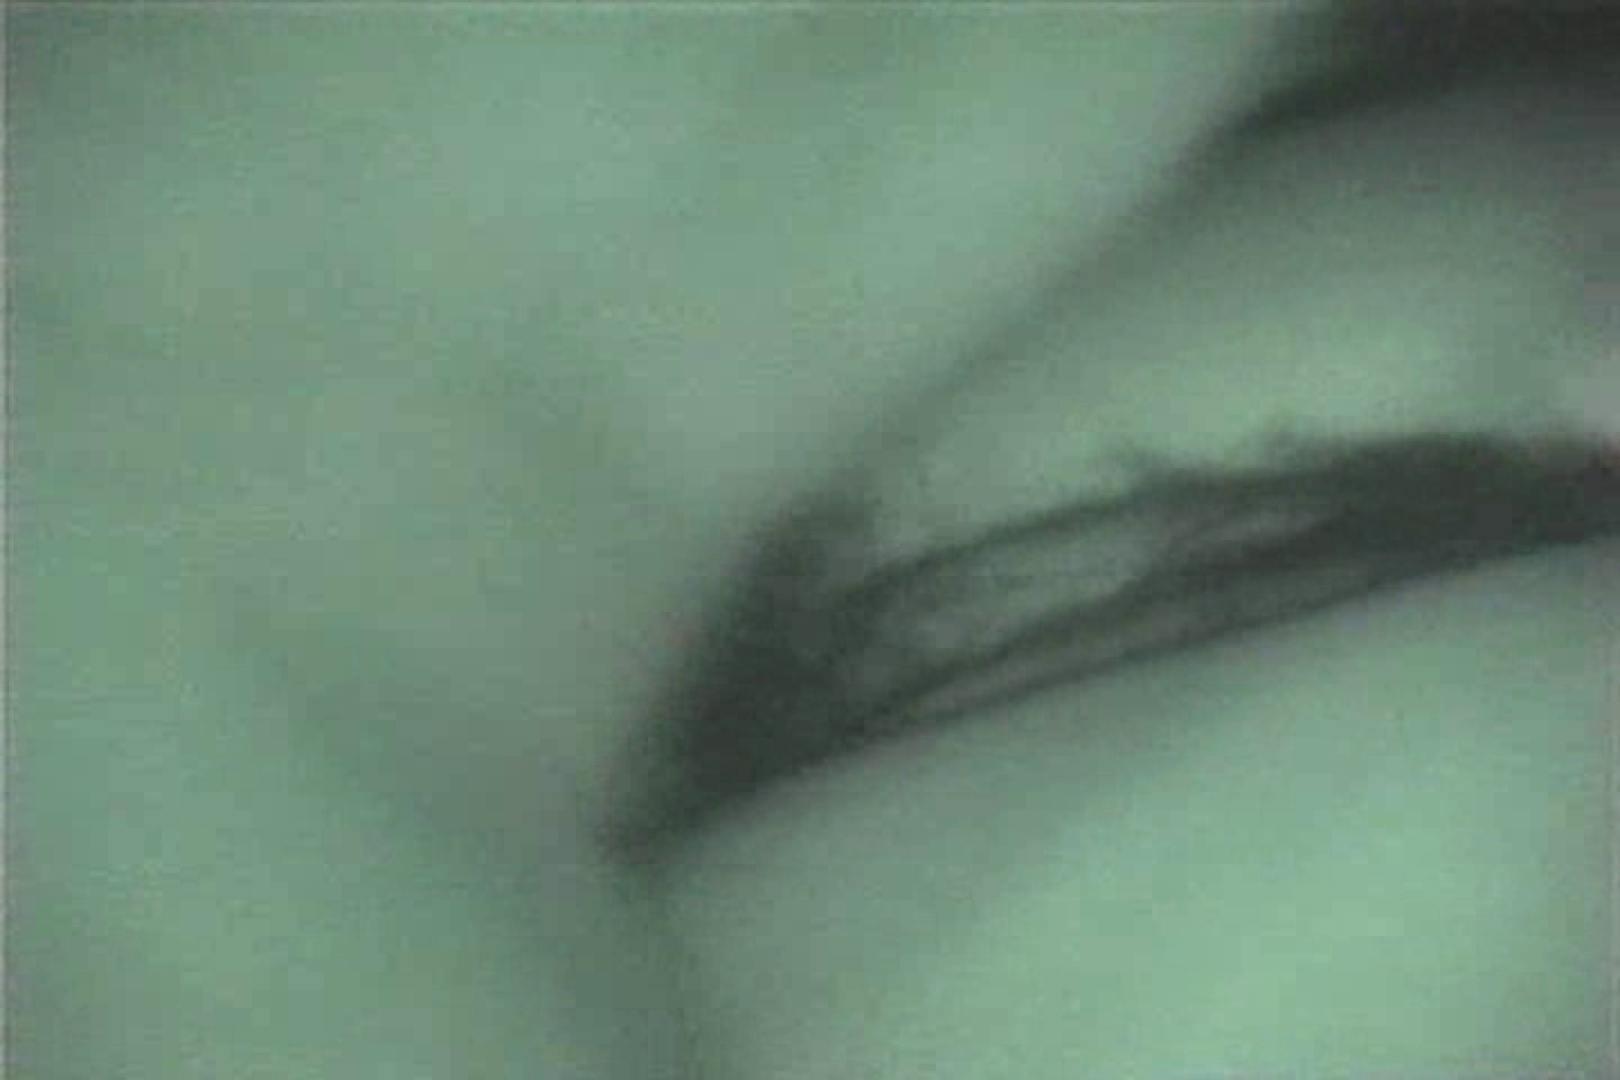 MASAさんの待ち伏せ撮り! 赤外線カーセックスVol.13 赤外線 | セックス  18pic 13